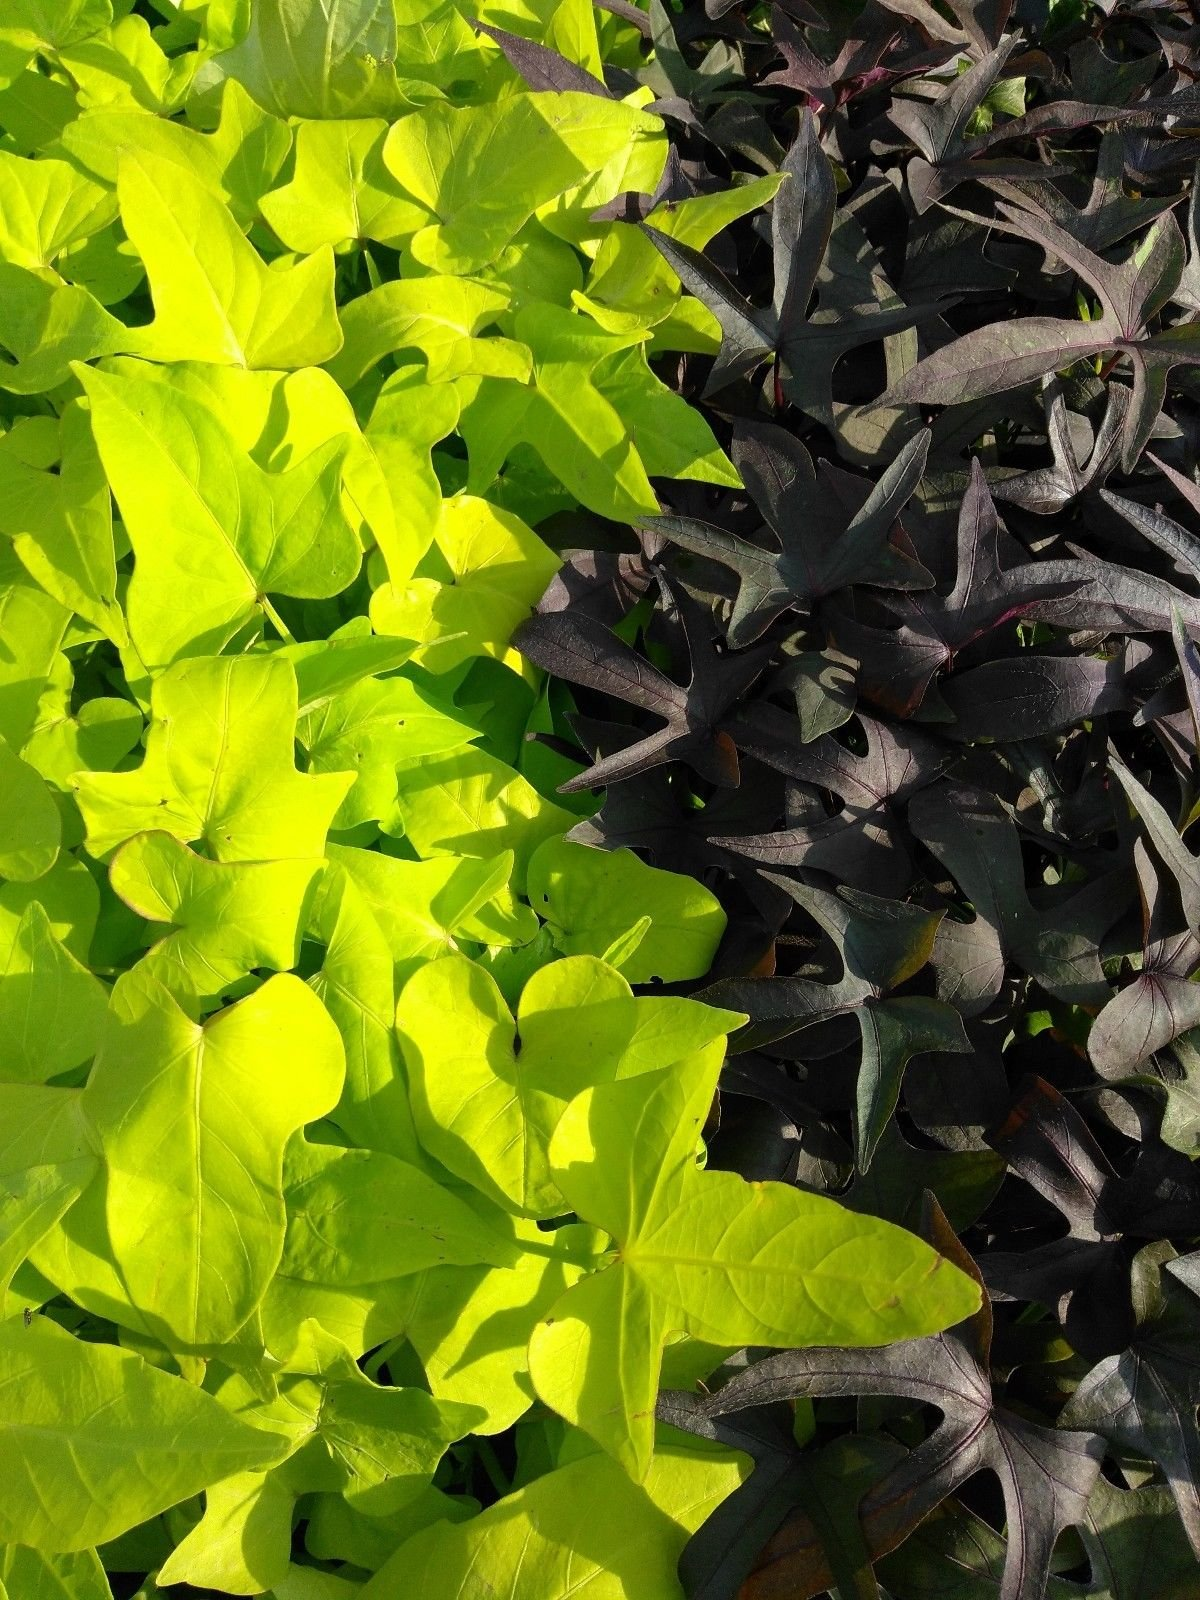 IPOMOEA SWEET POTATO VINE - BLACKIE Margarite mix - 30 PLANTS - STARTERS by joescrazyplants